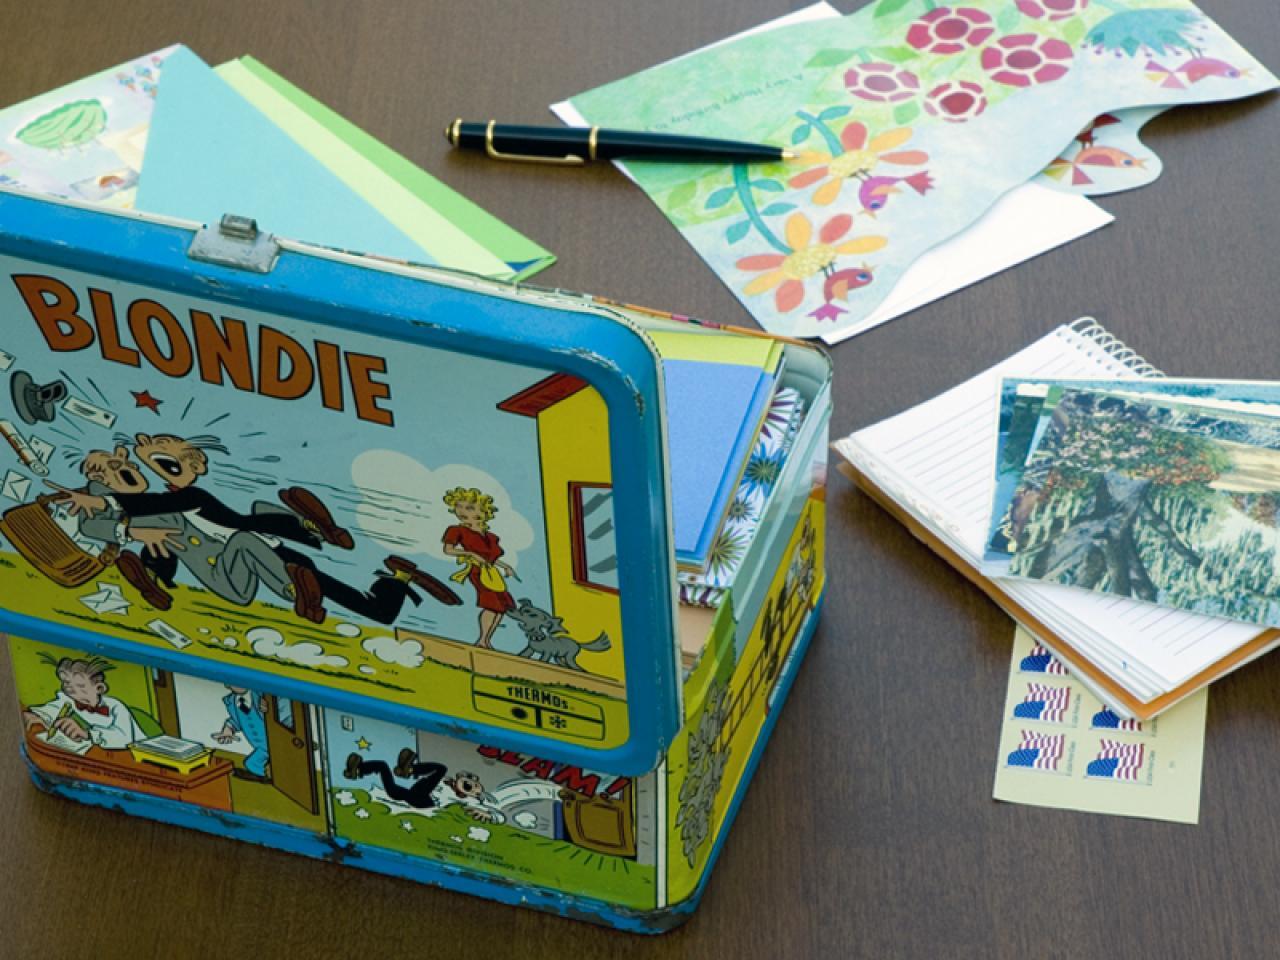 Back to school organize with lunchbox storage organization ideas